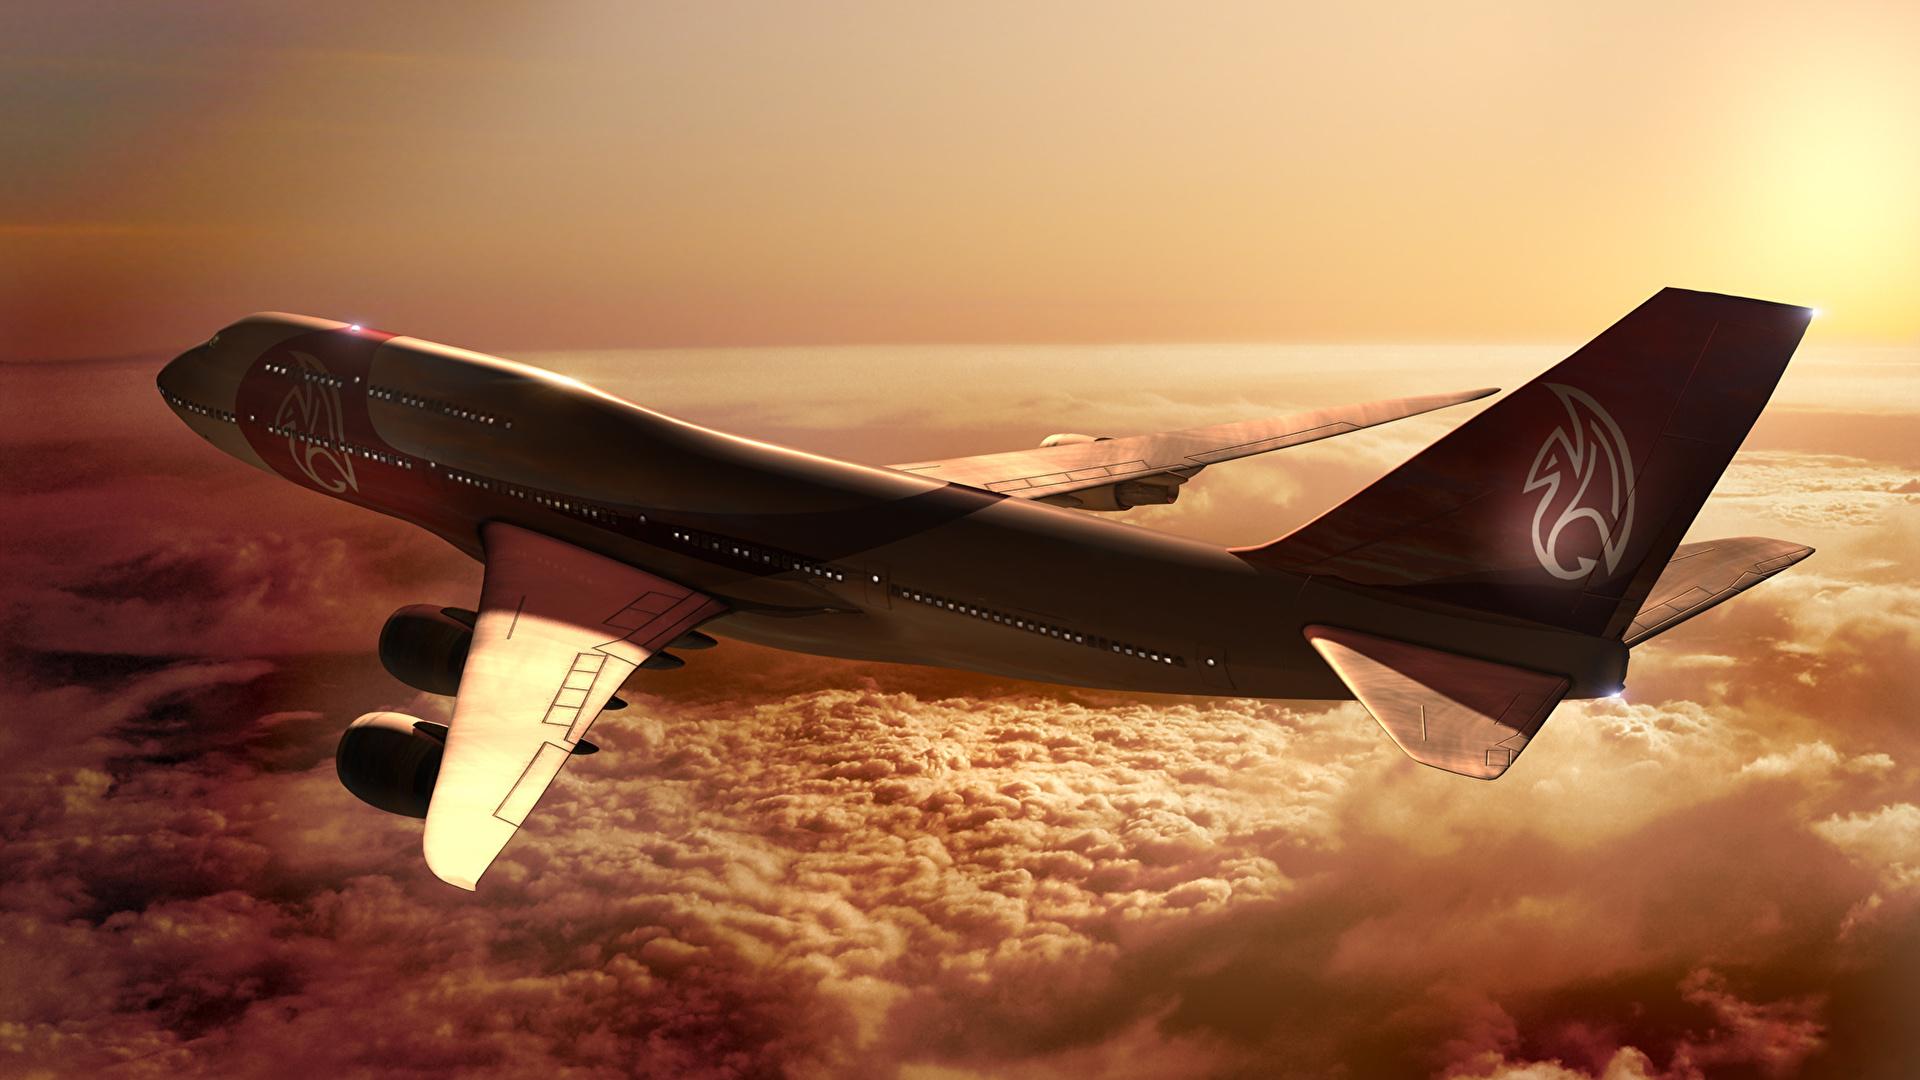 Обои boeing 747. Авиация foto 16